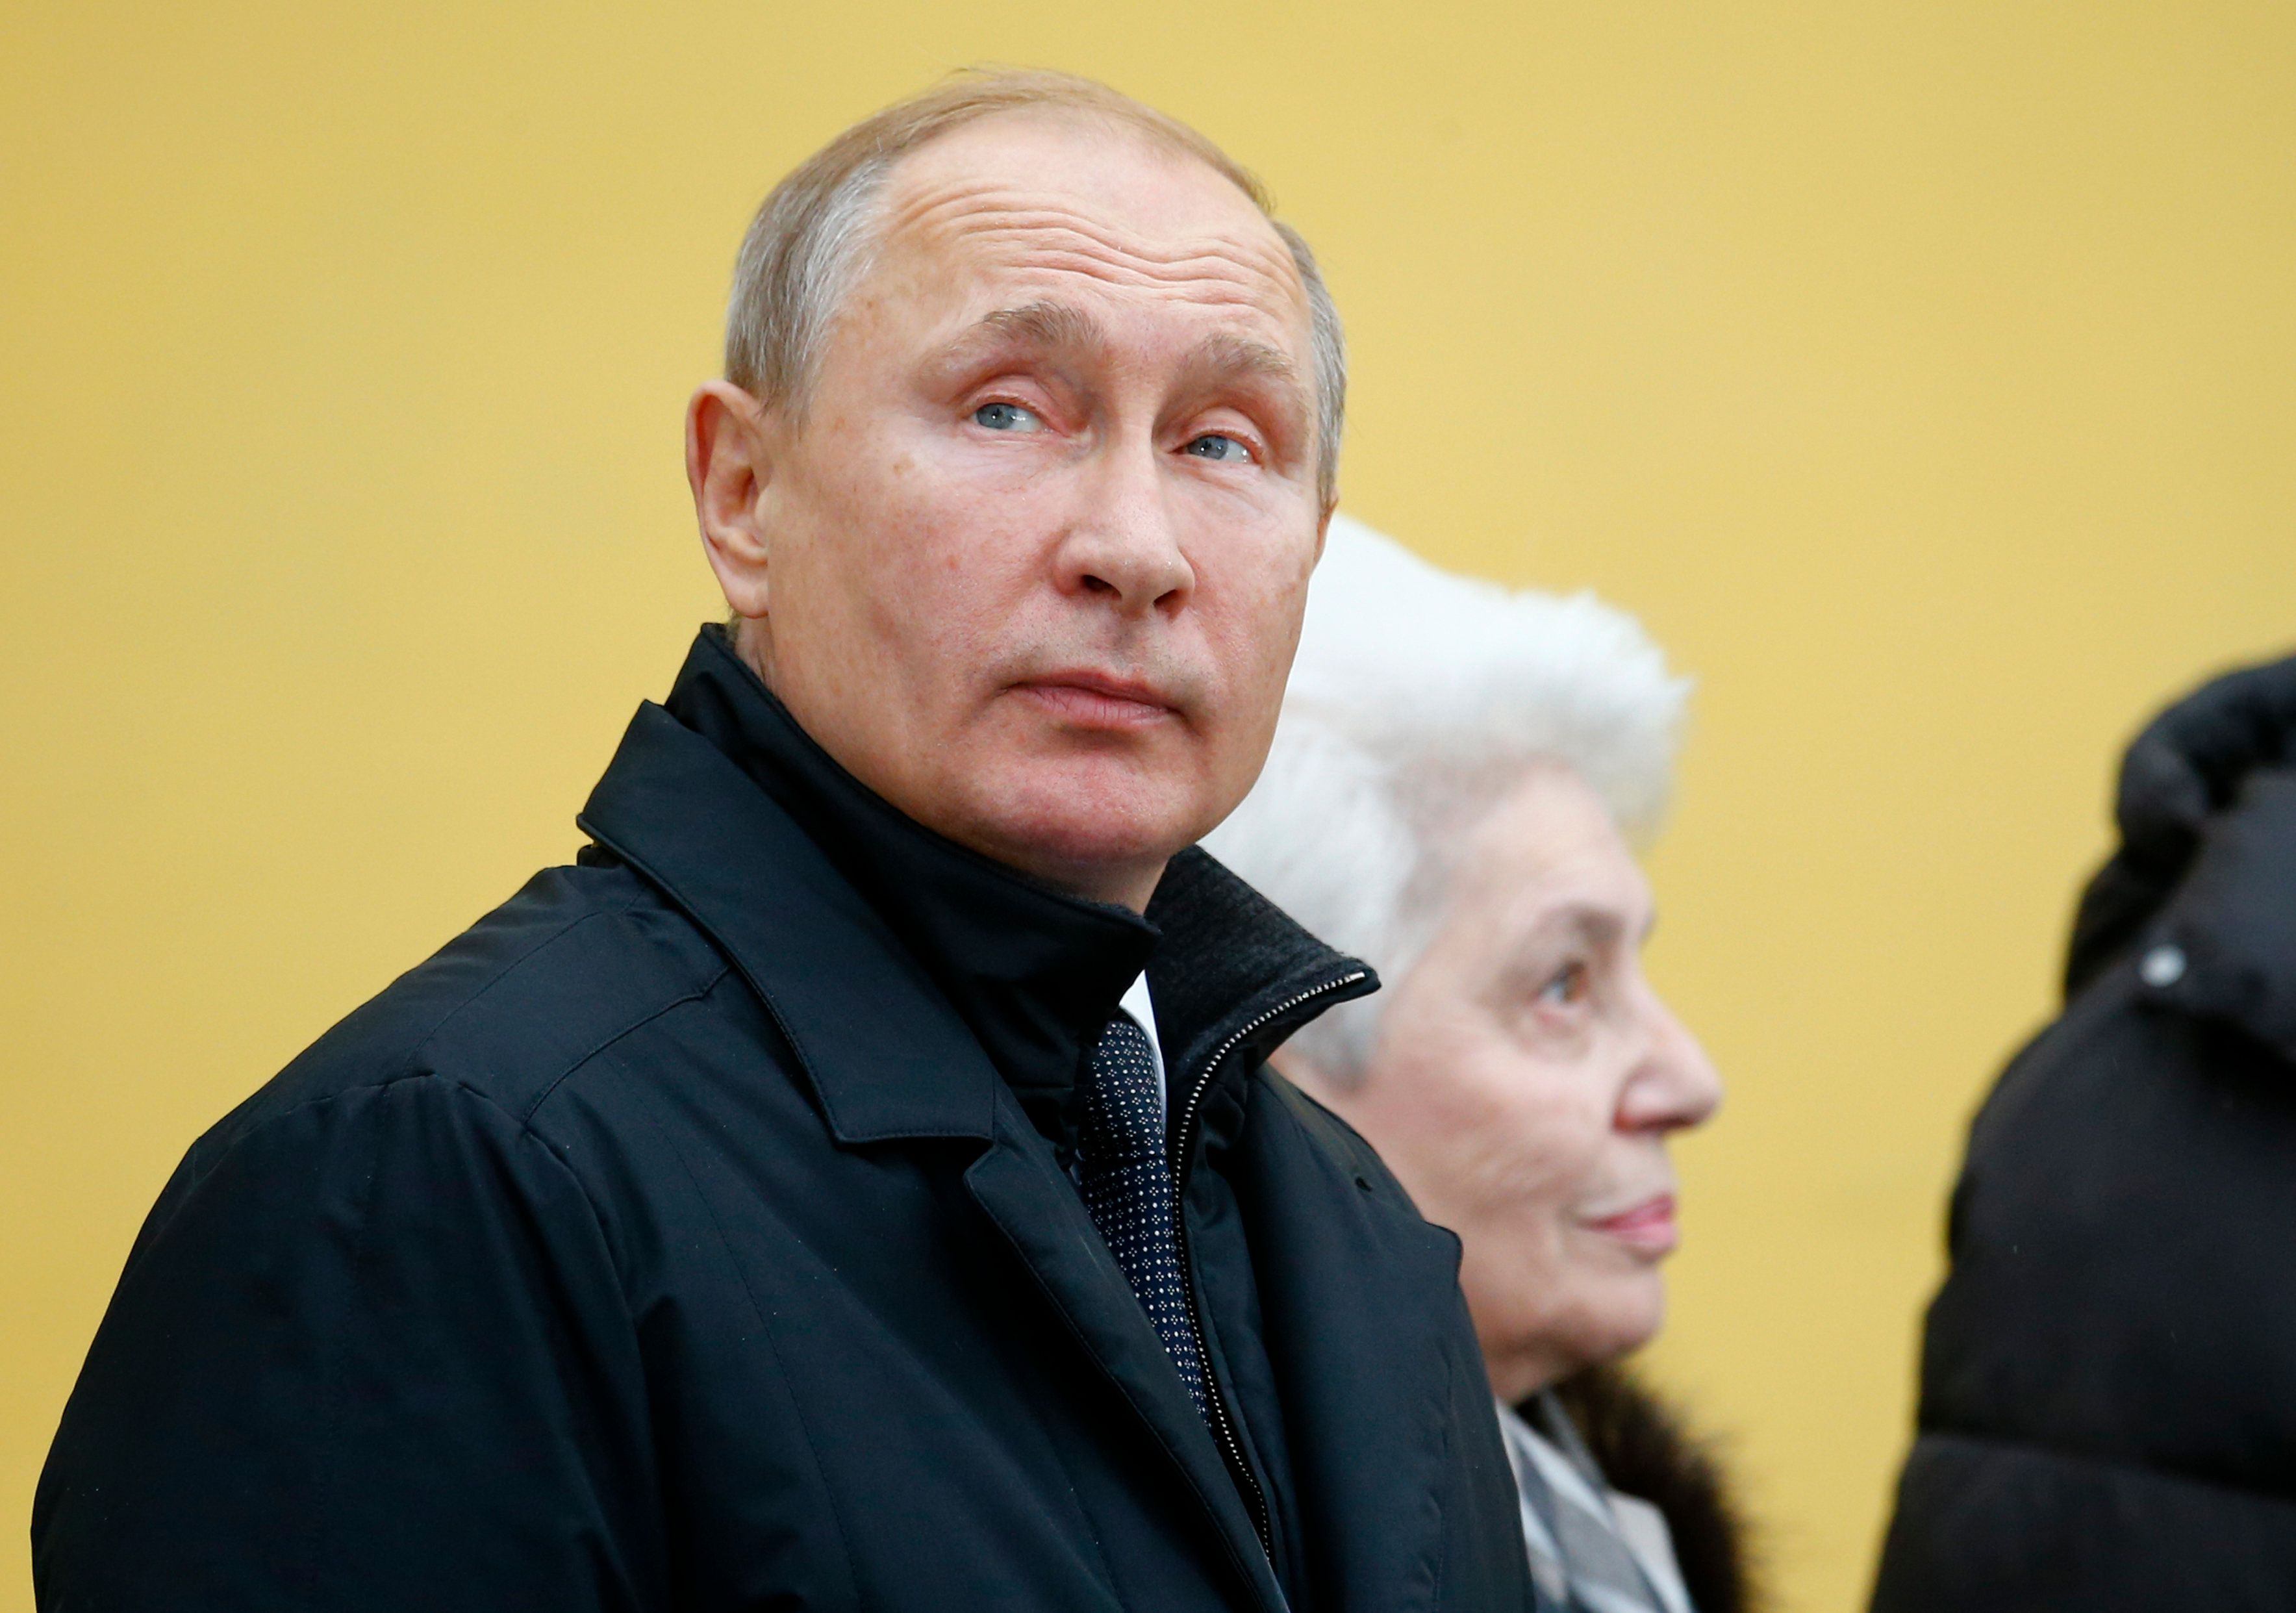 Vladimir Putin Makes Moves To Control Rap Music In Russia